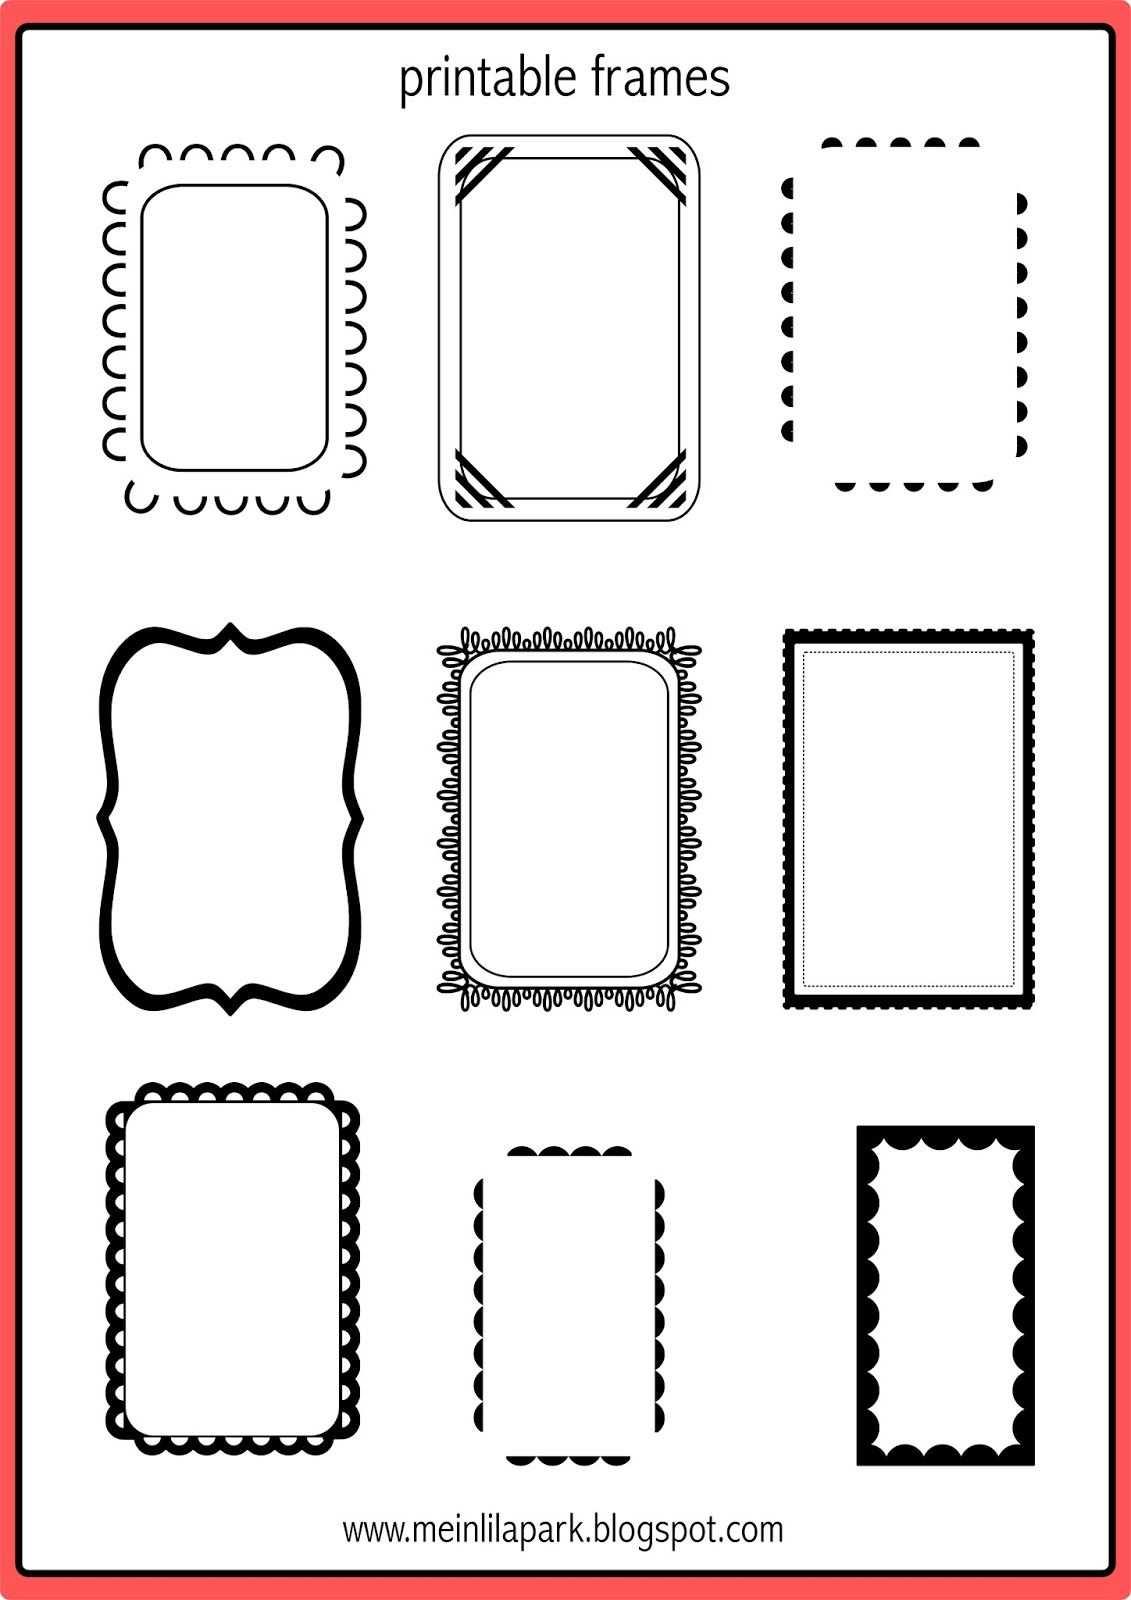 Free Printable Doodle Frames Ausdruckbare Etiketten Freebie